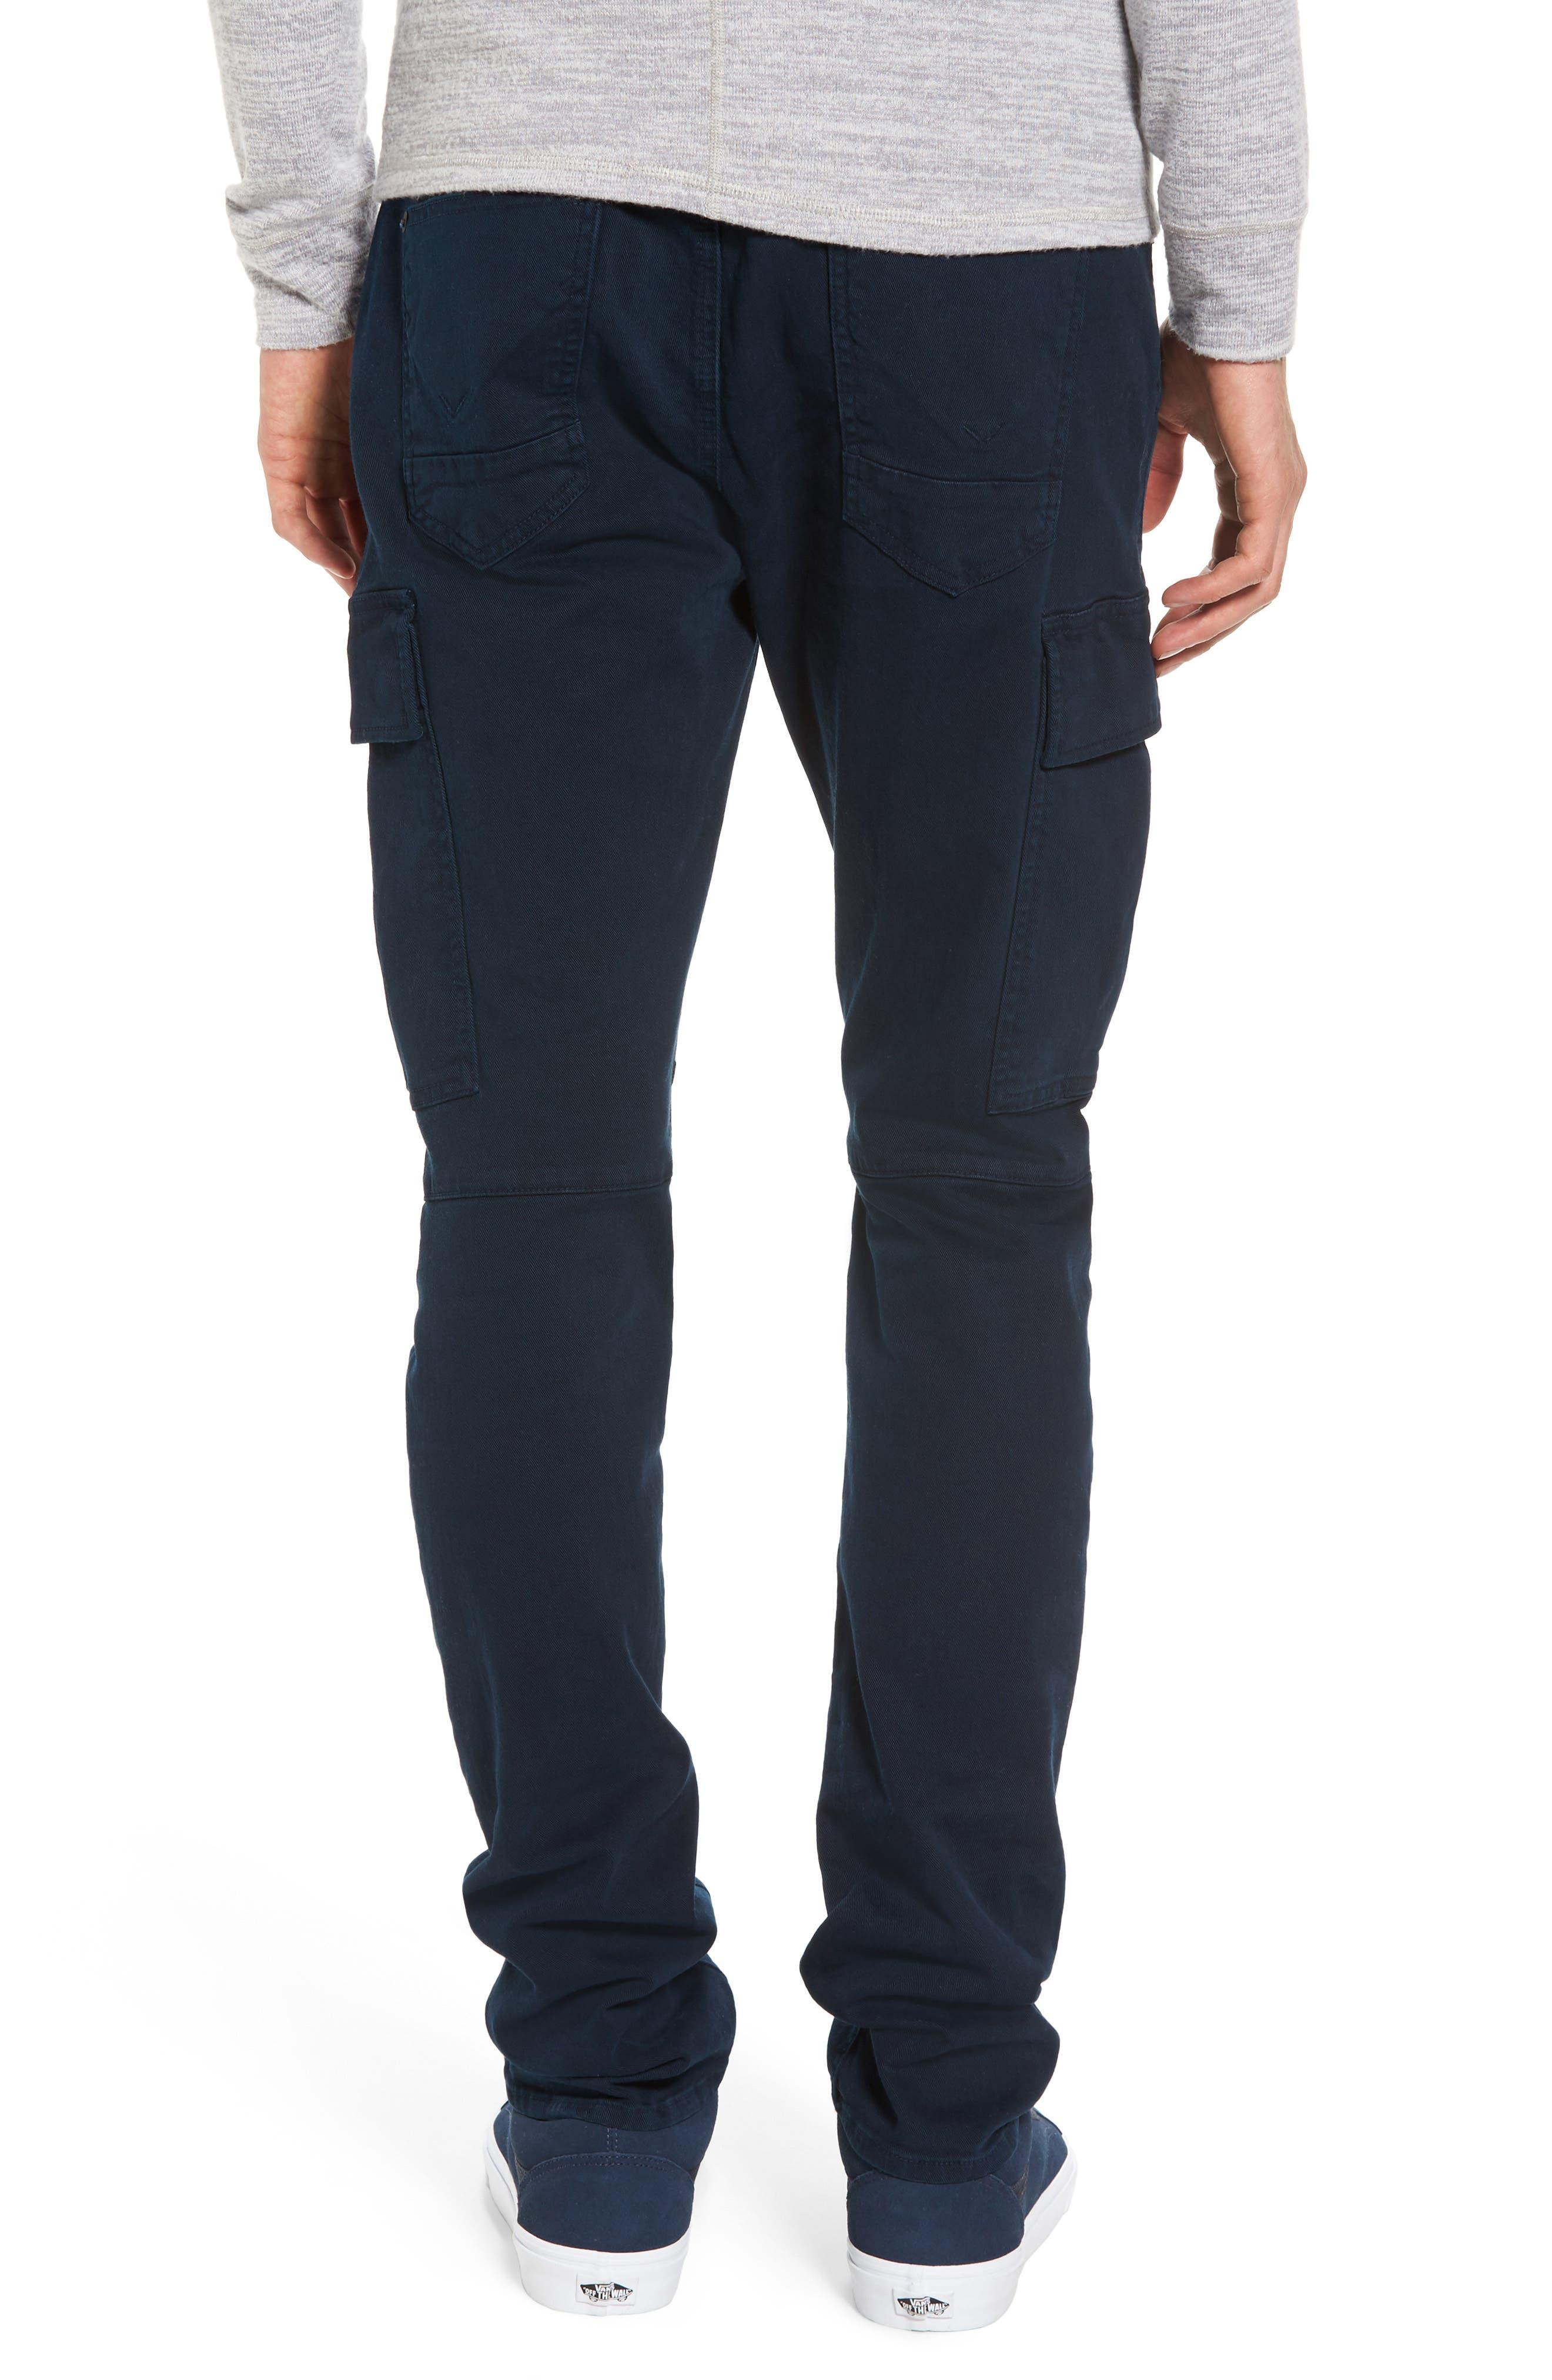 Greyson Cargo Biker Skinny Fit Jeans,                             Alternate thumbnail 2, color,                             Ink